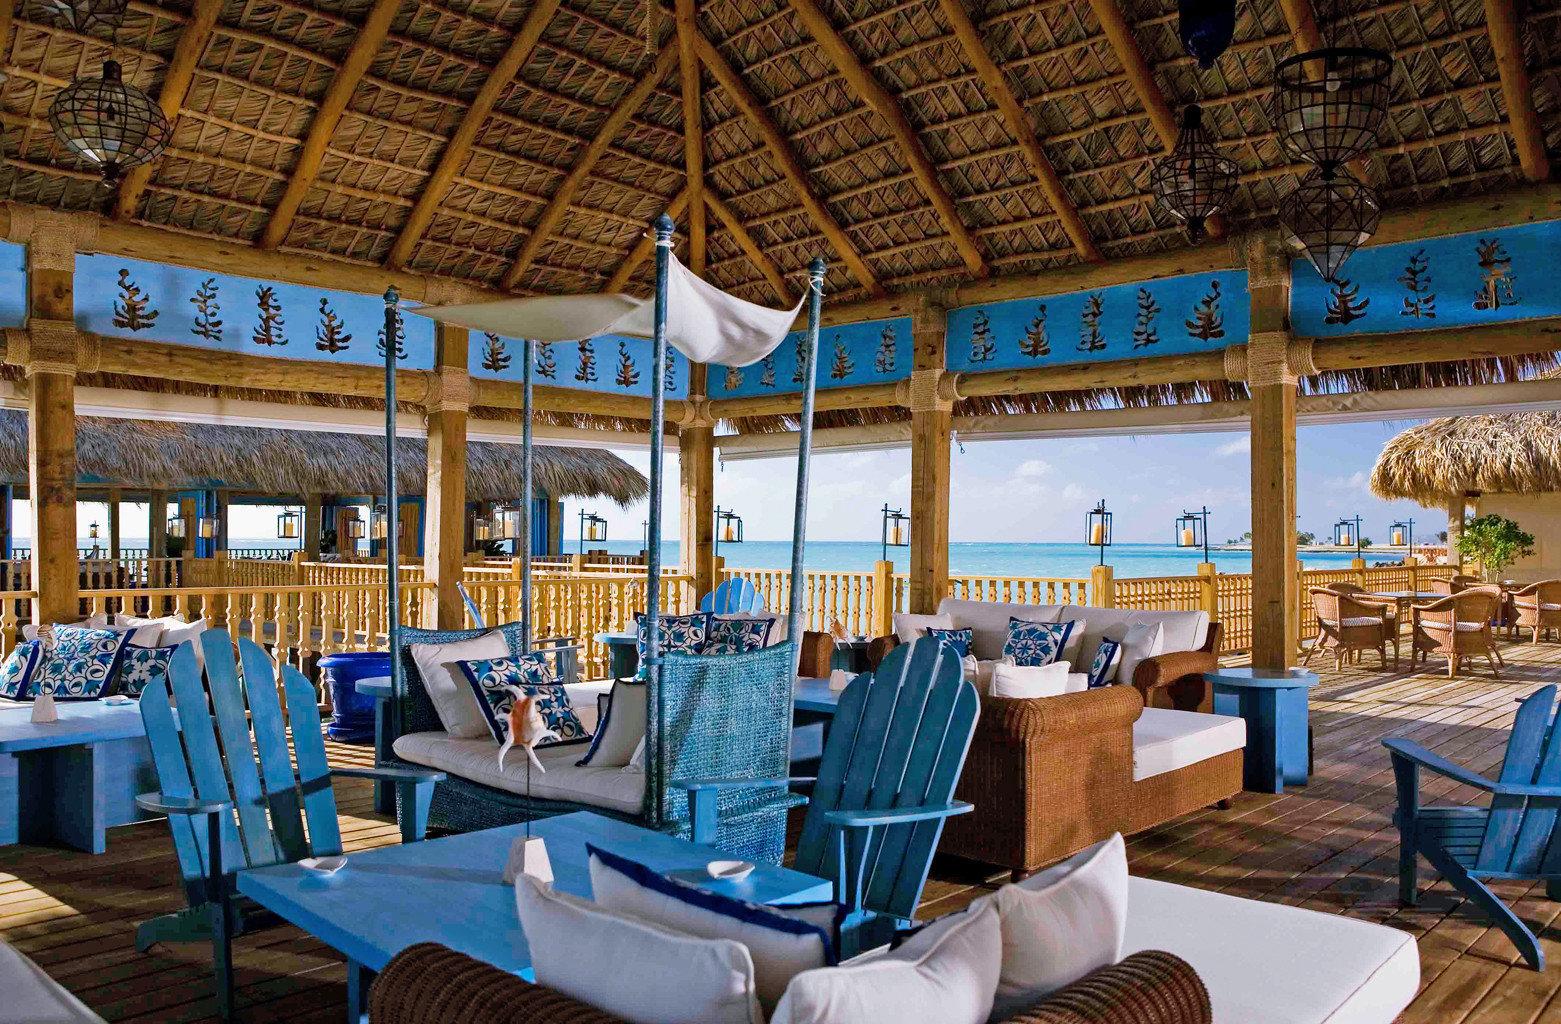 Beachfront Hotels Living Lounge Luxury Modern table chair restaurant Resort estate blue palace meal set